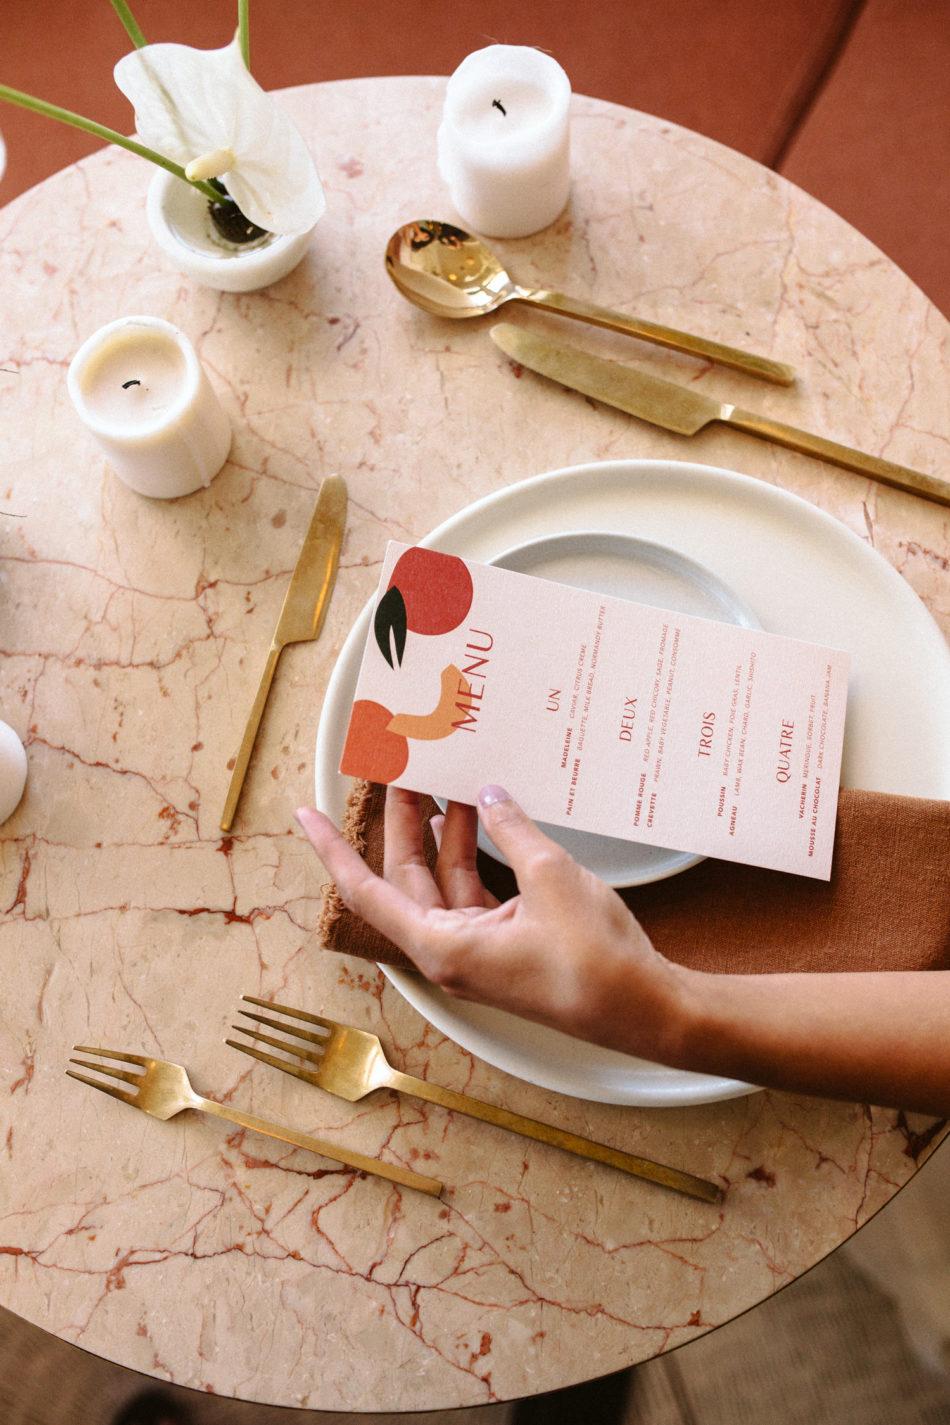 Photoshoot inspiration mariage moderne et simple, menu de mariage moderne